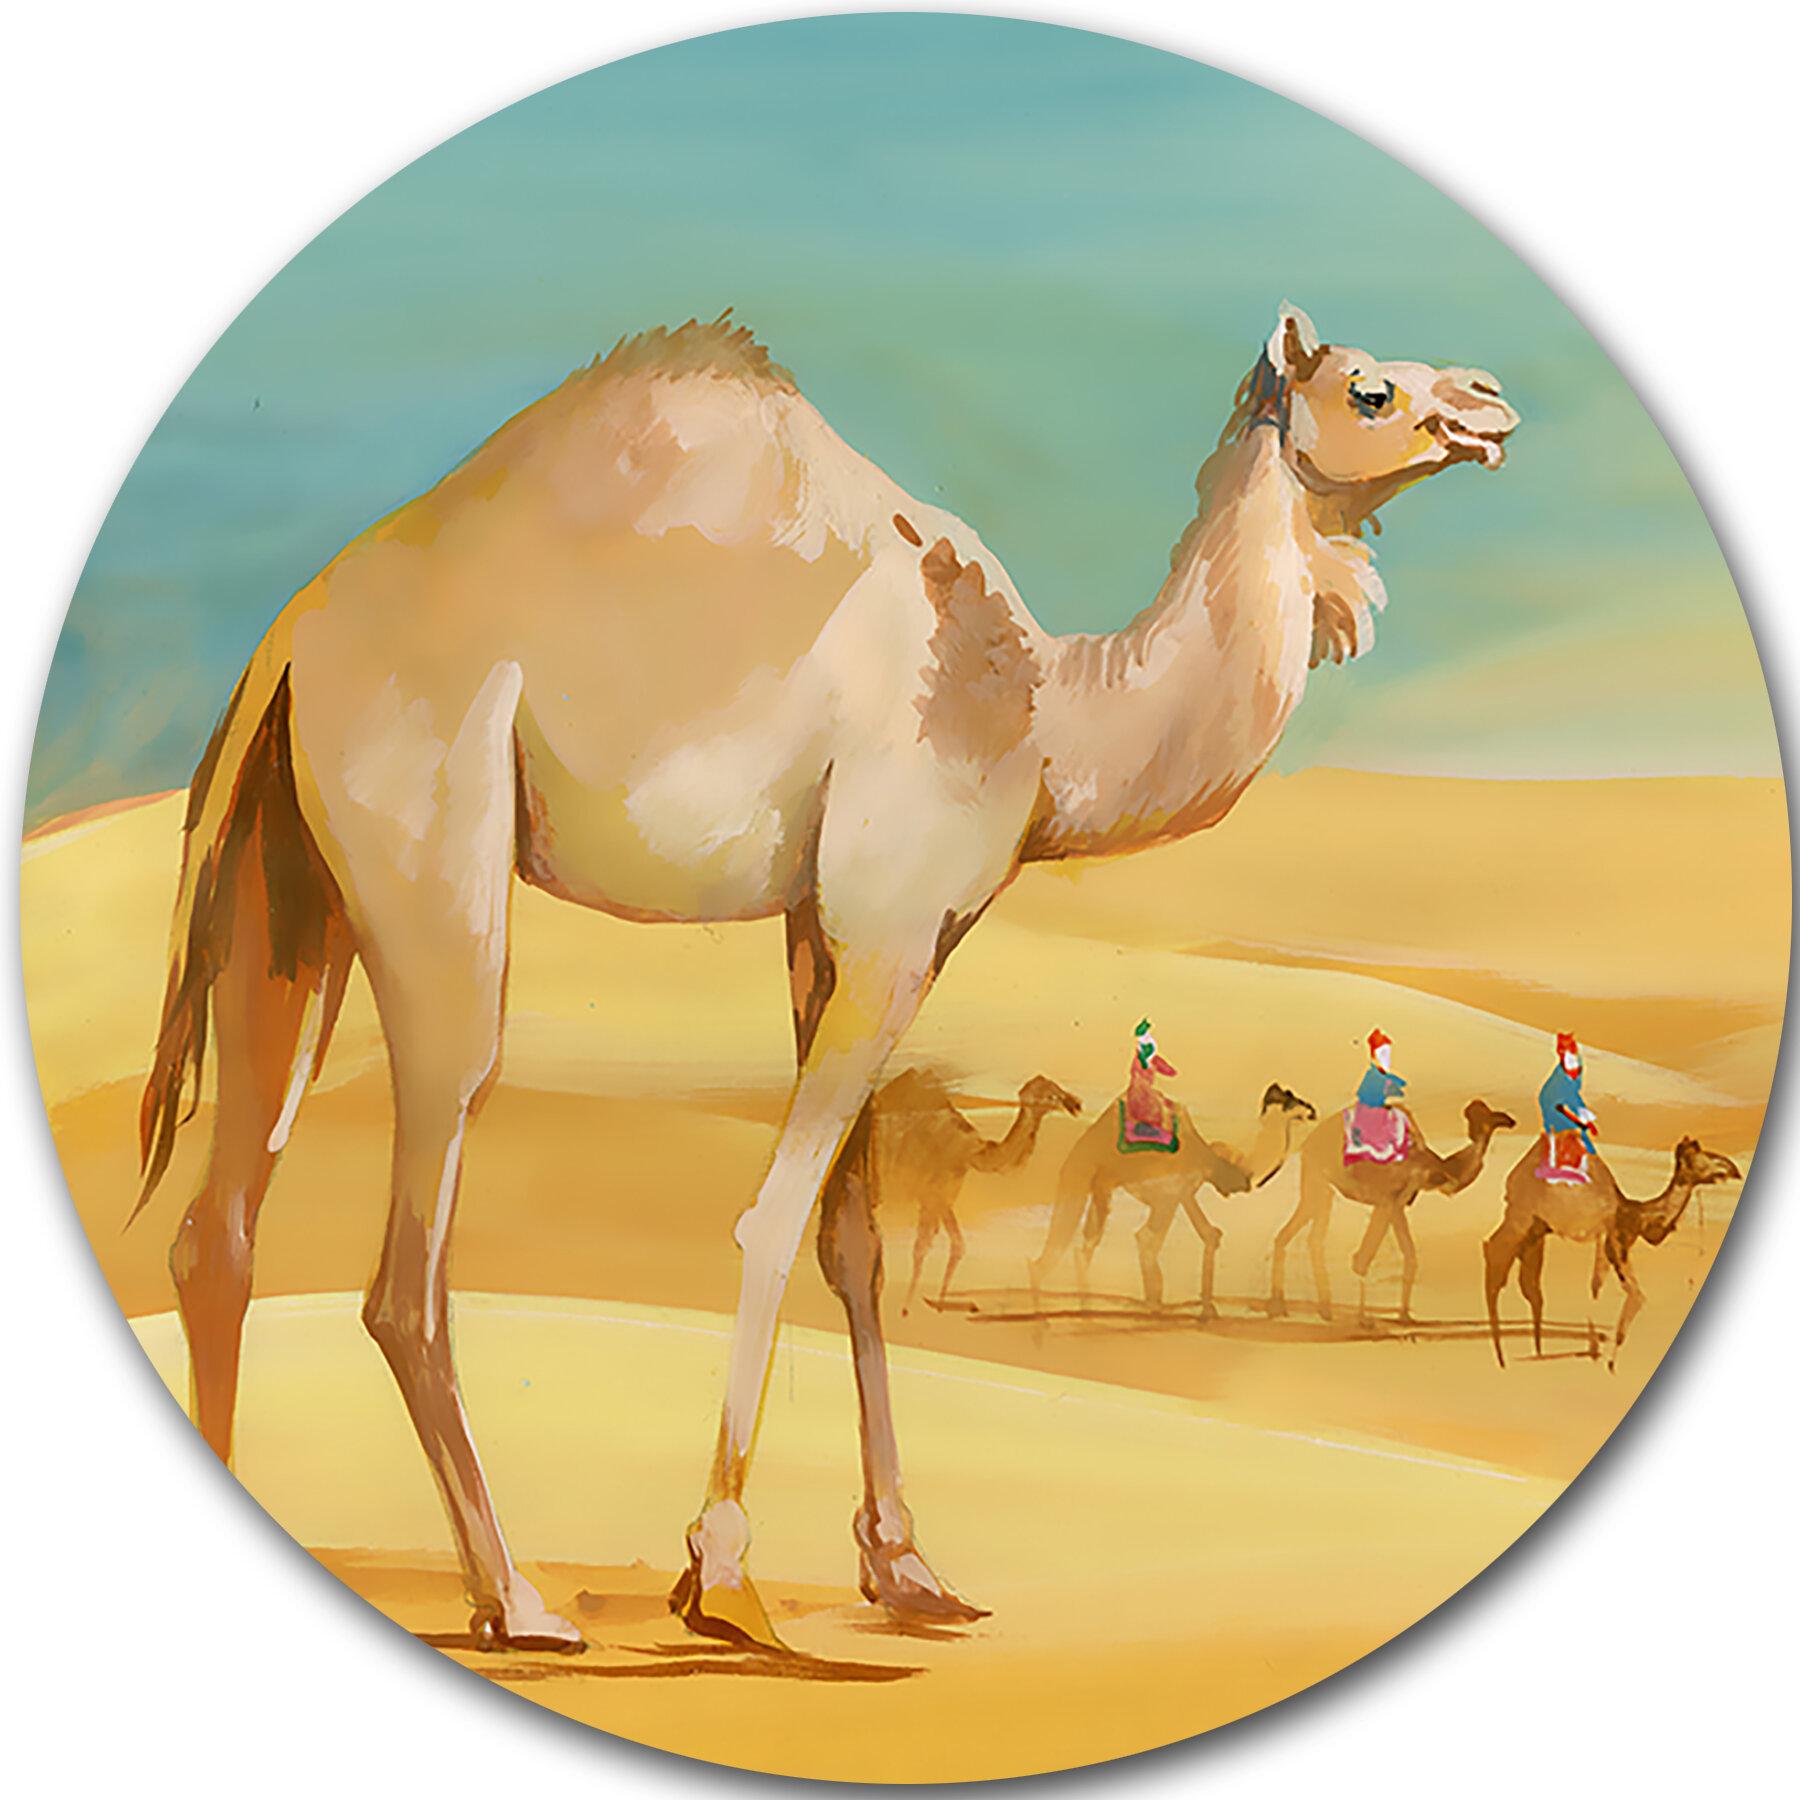 DesignArt \'Camel Walking in Desert\' Painting Print on Metal | Wayfair.ca